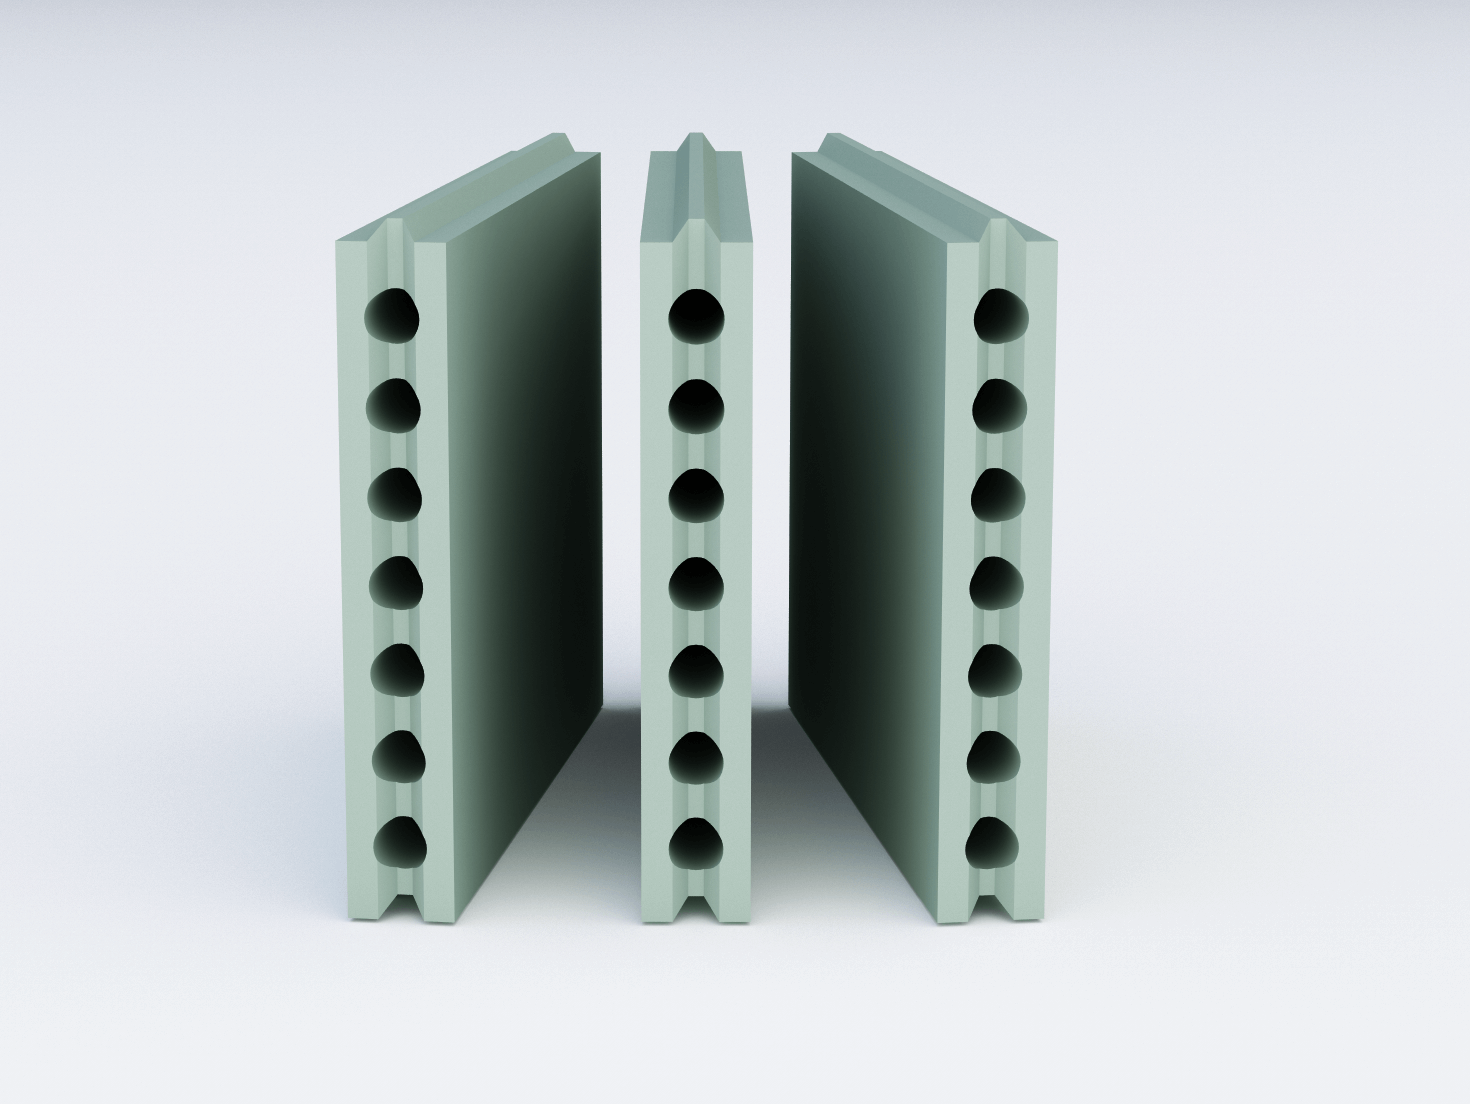 водостойкие блоки